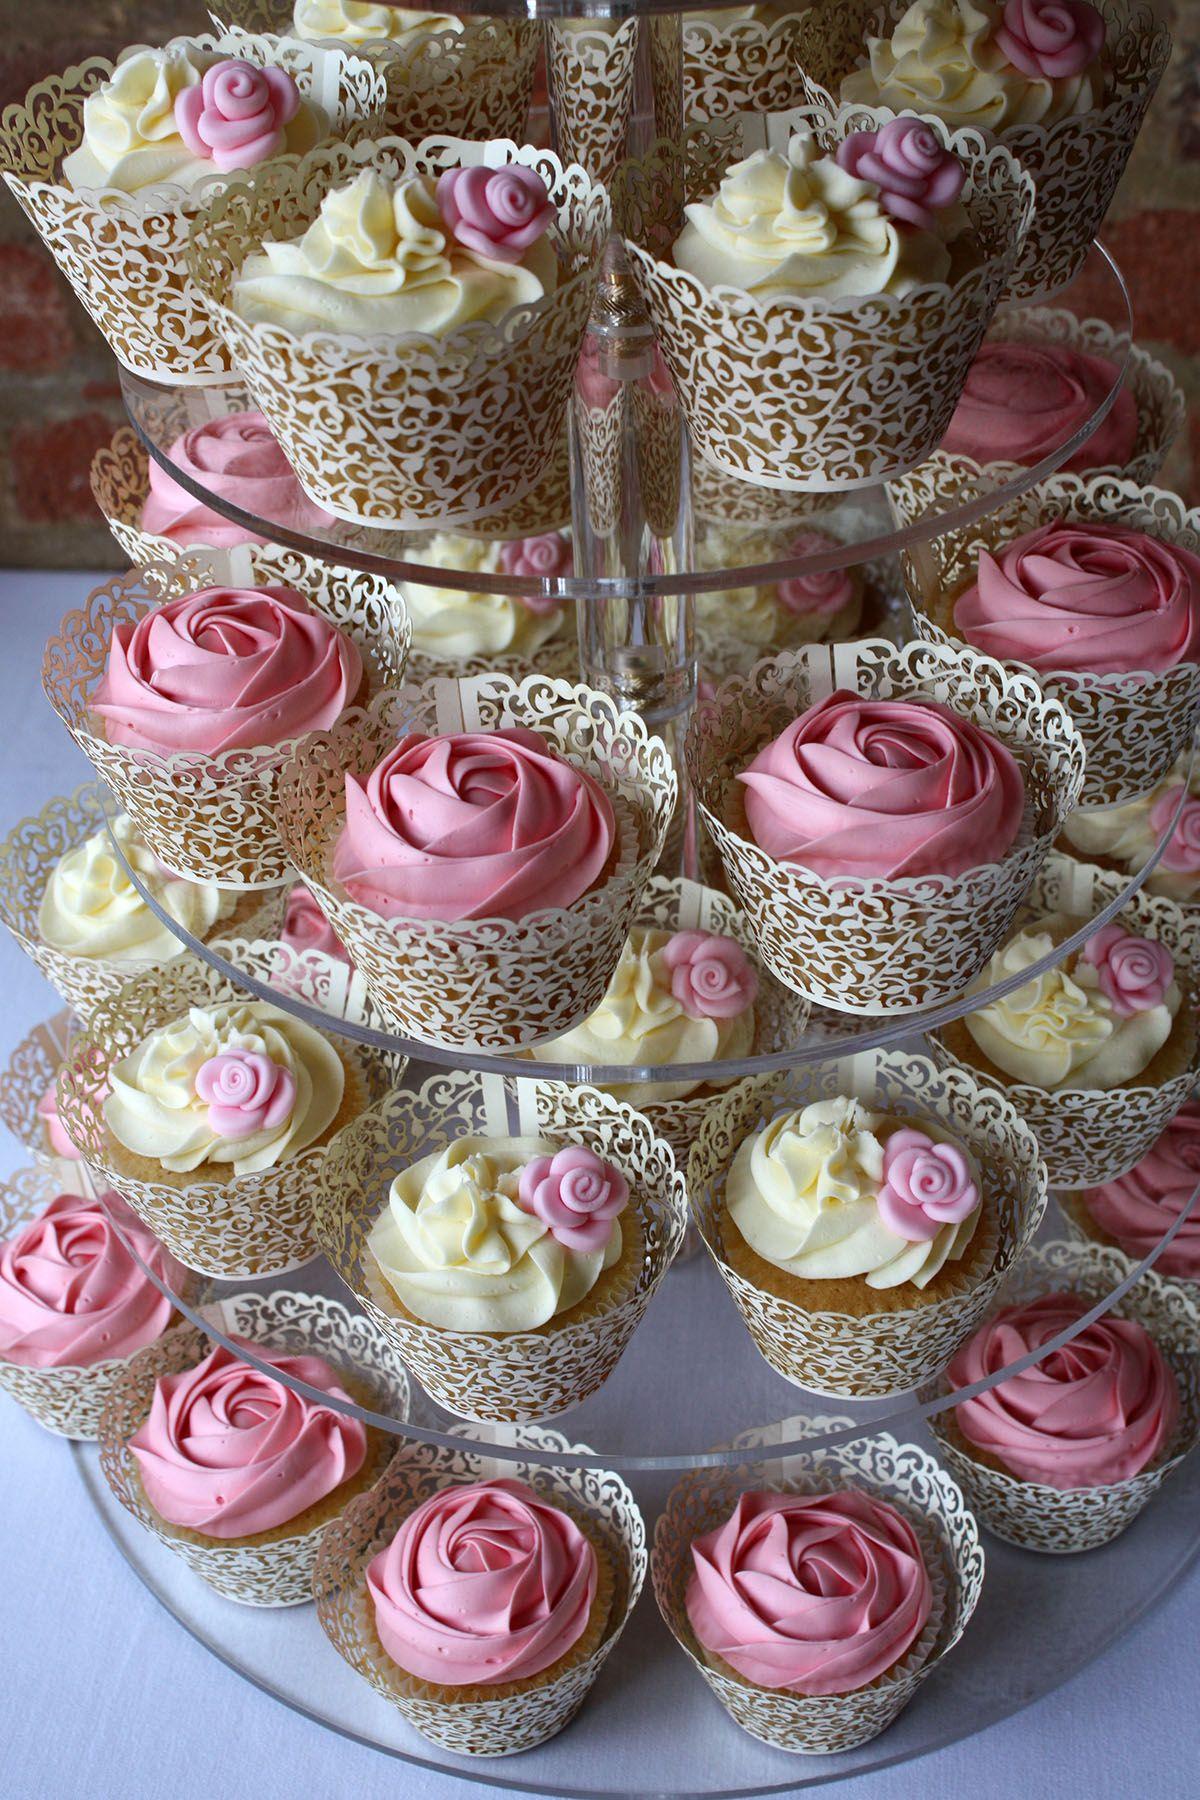 Wedding Cupcakes Gallery In 2020 Bridal Shower Cupcakes Wedding